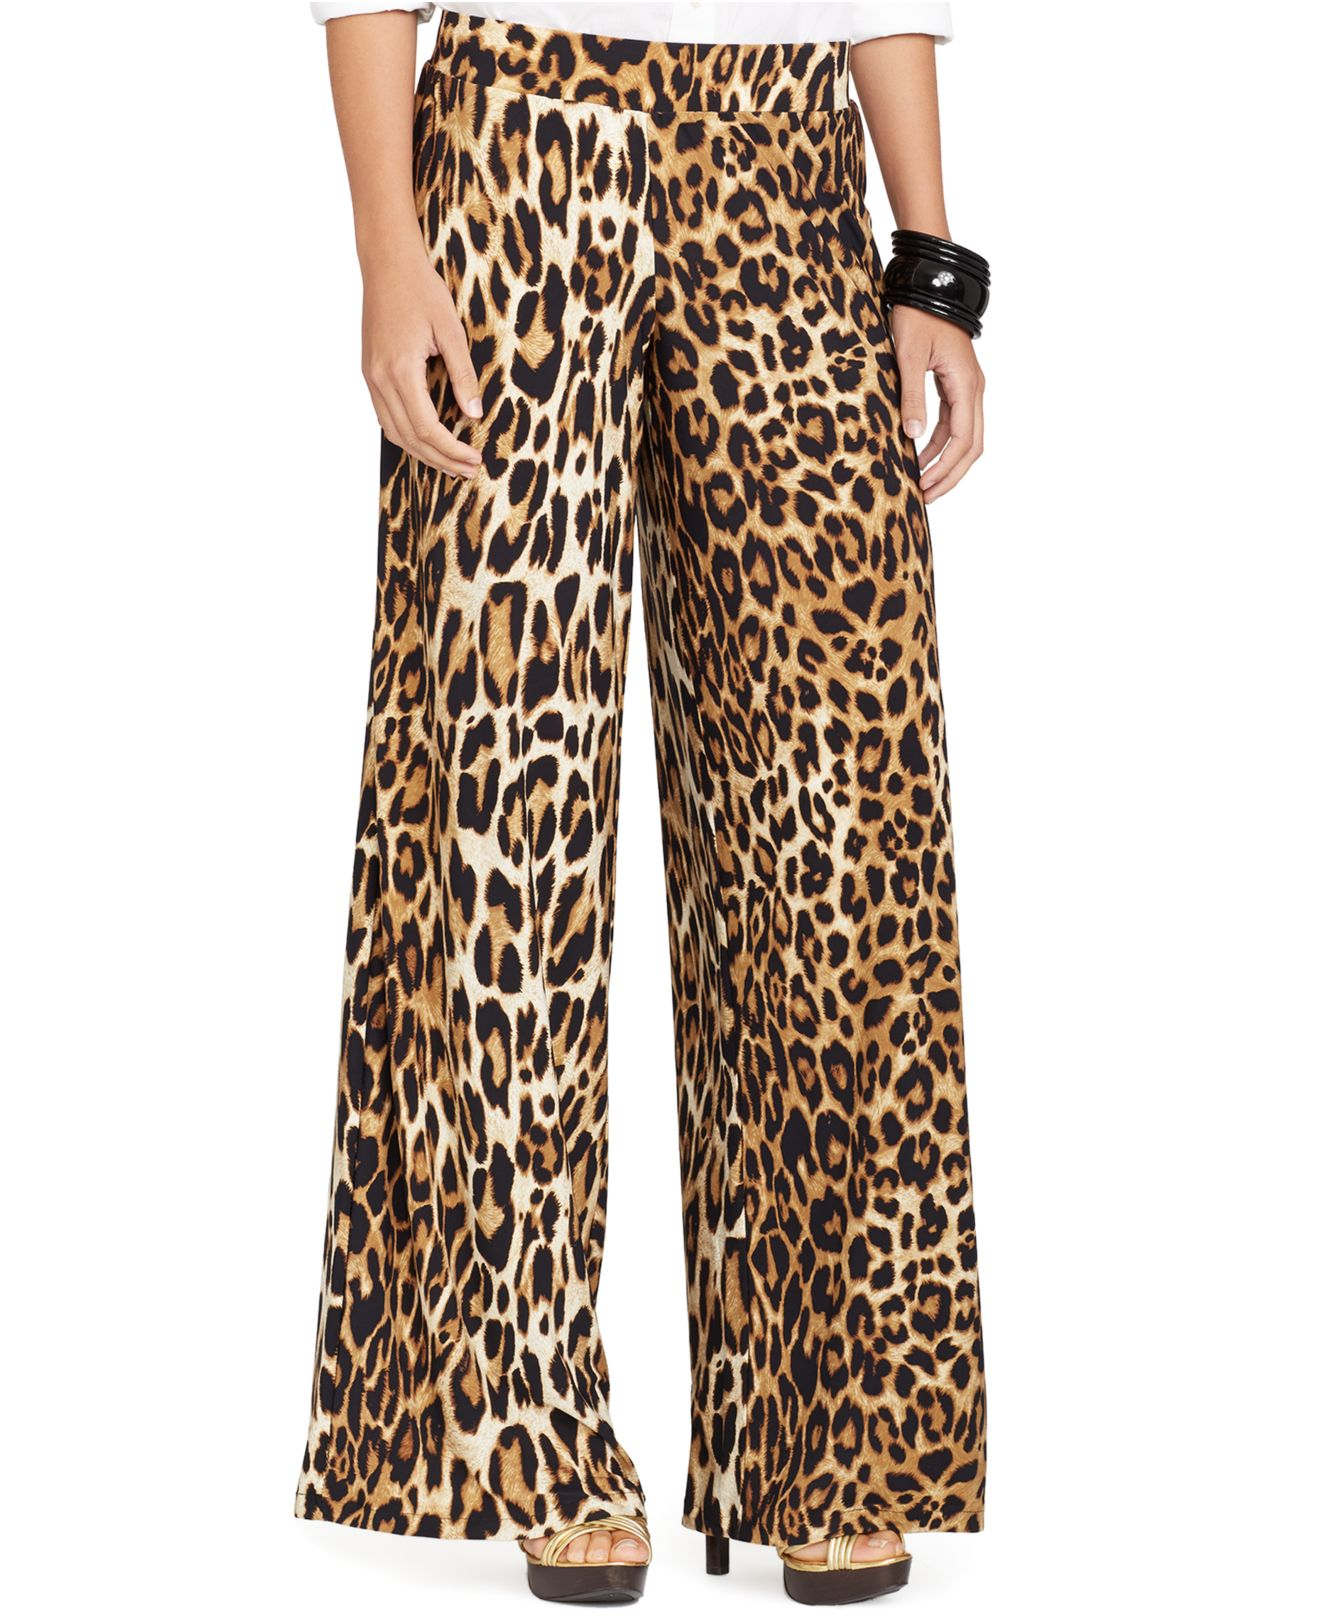 Ralph lauren Leopard-print Wide-leg Pant | Lyst